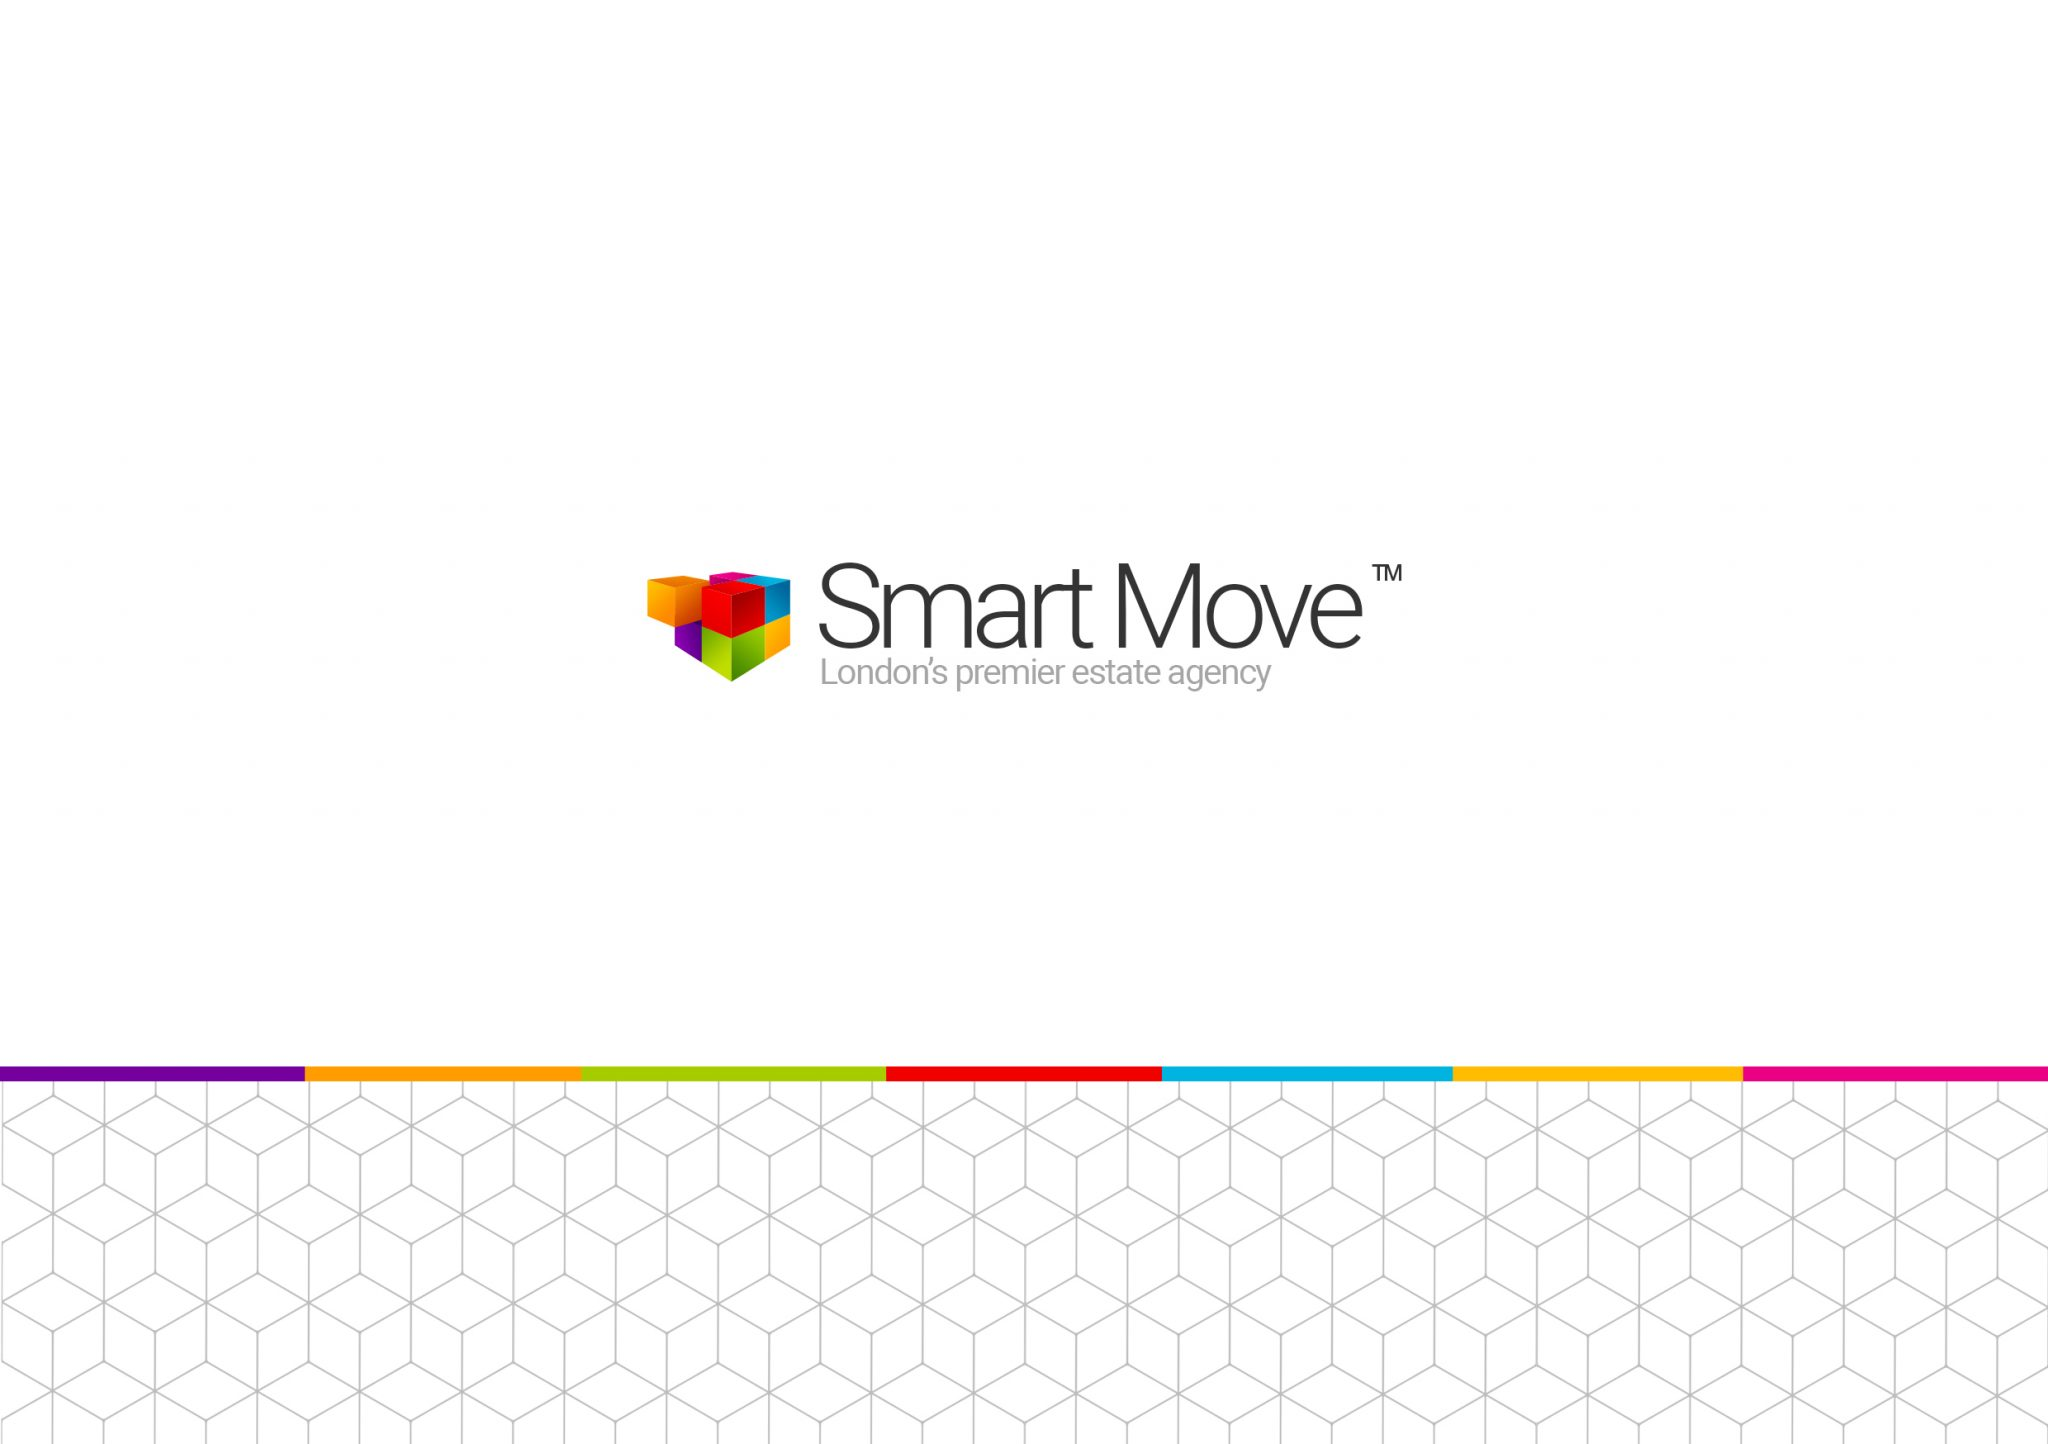 Smart Move Logo Dark - Smart Move (website) - Creative Digital